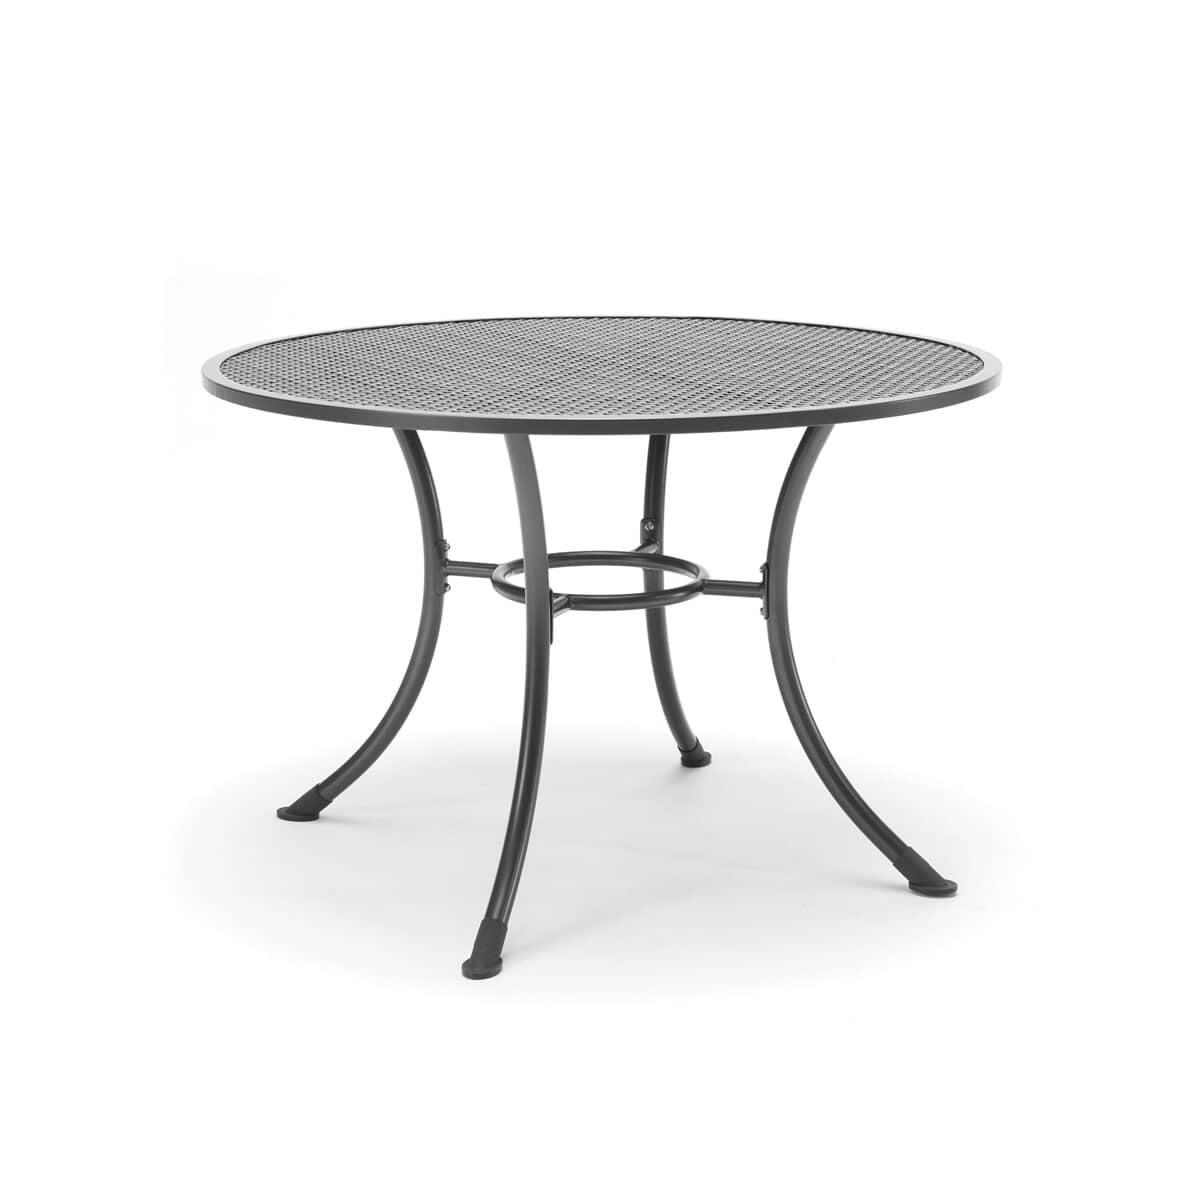 kettler lattice top table 110cm t17190200s garden furniture world. Black Bedroom Furniture Sets. Home Design Ideas